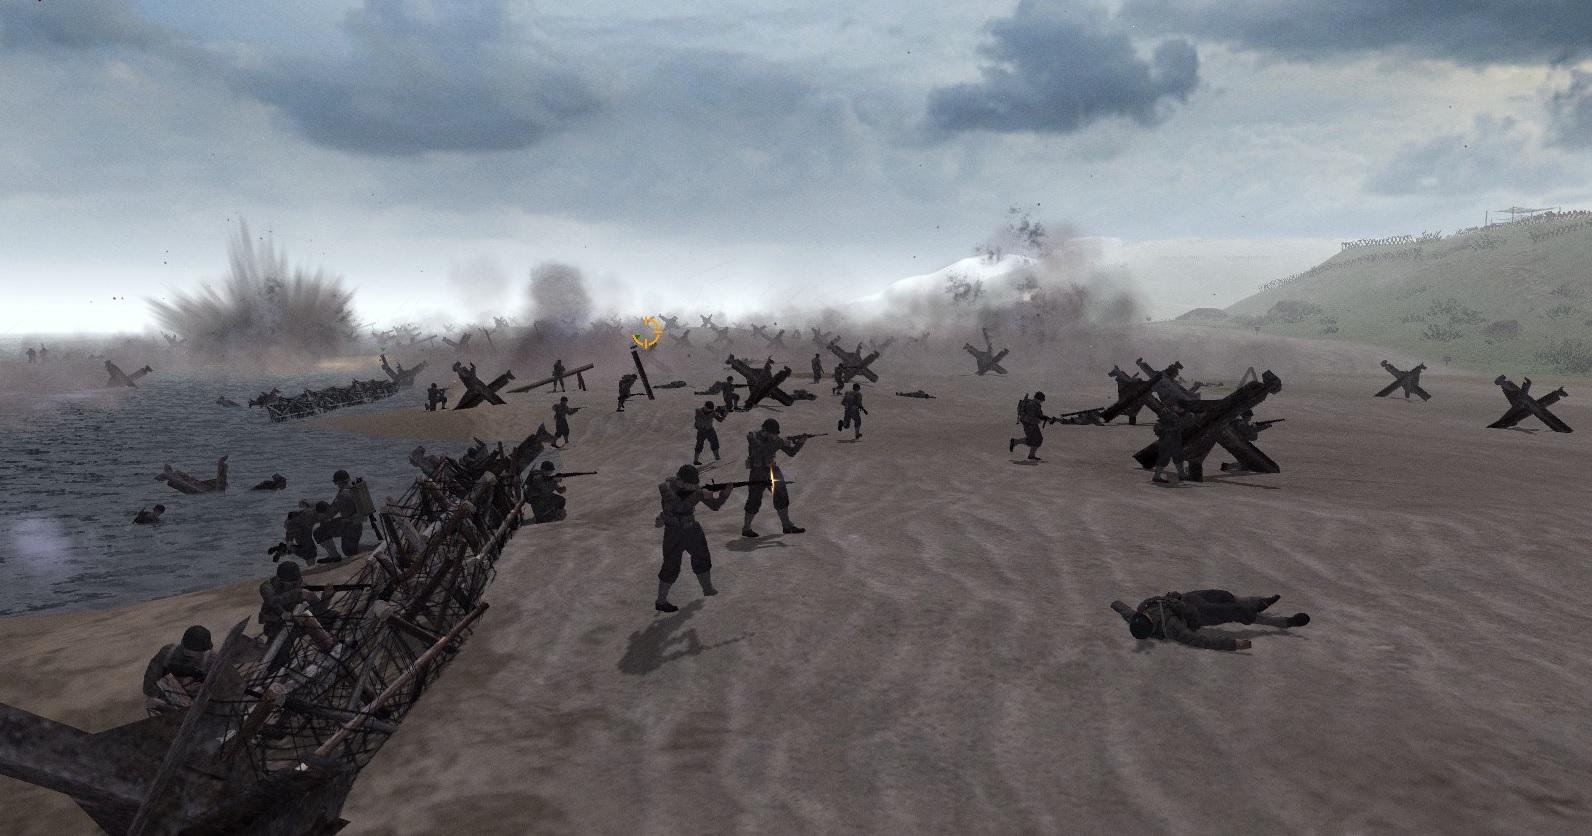 Скачать Omaha Beach - Historical Scenario Version 2.0 (RobZ) (Editor) (AS2 — 3.260.0) — бесплатно